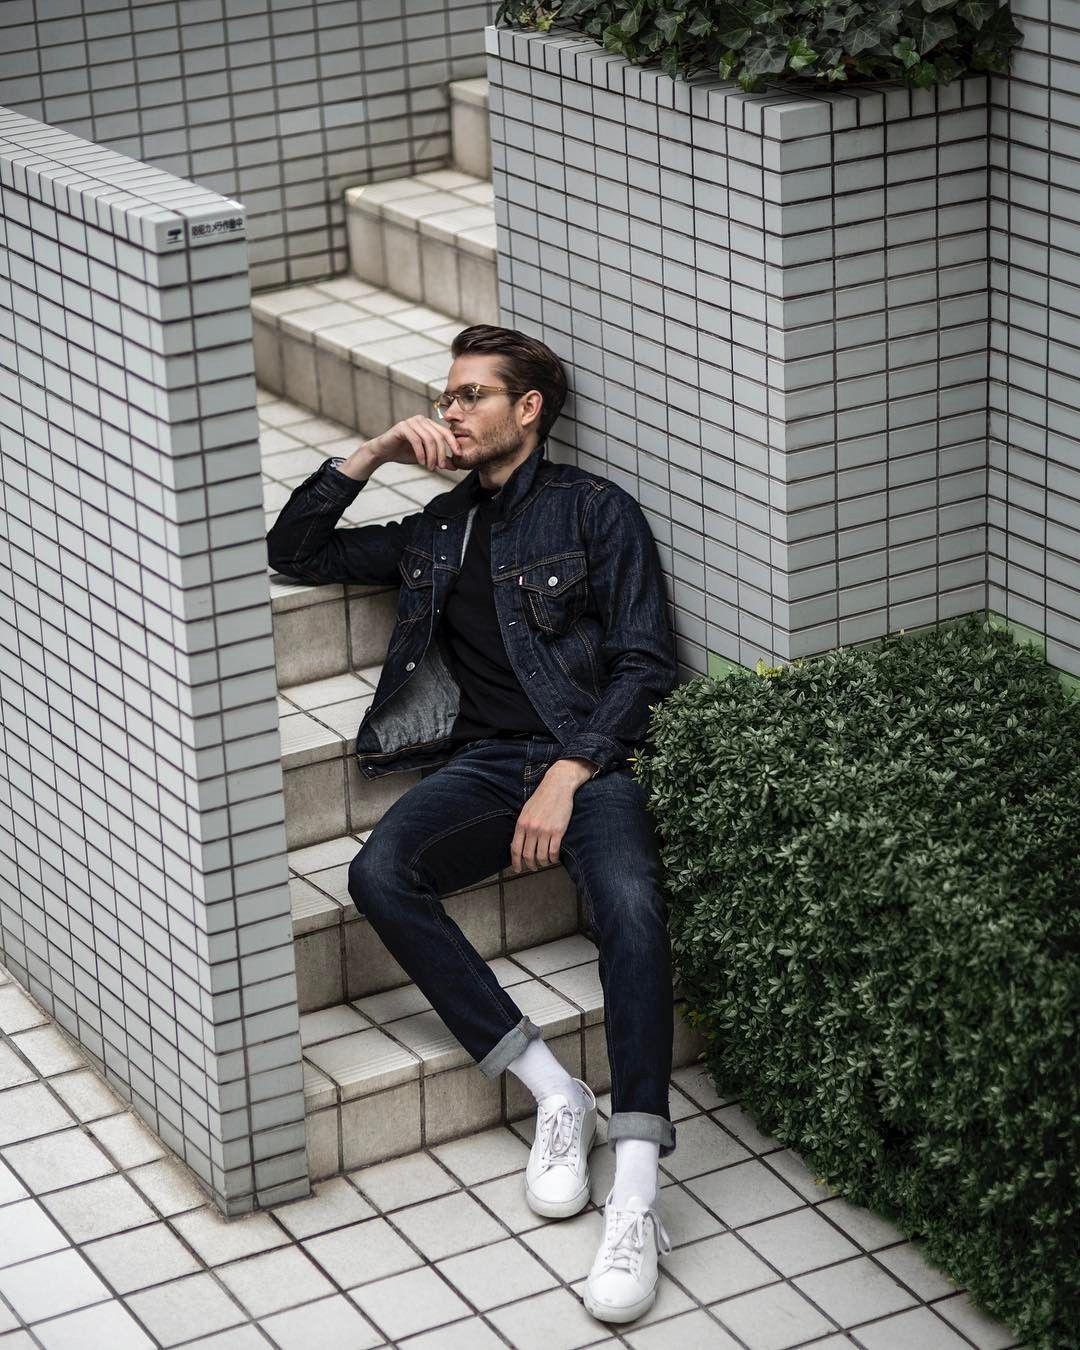 How to Build a Stylish Streetwear Like an Expert